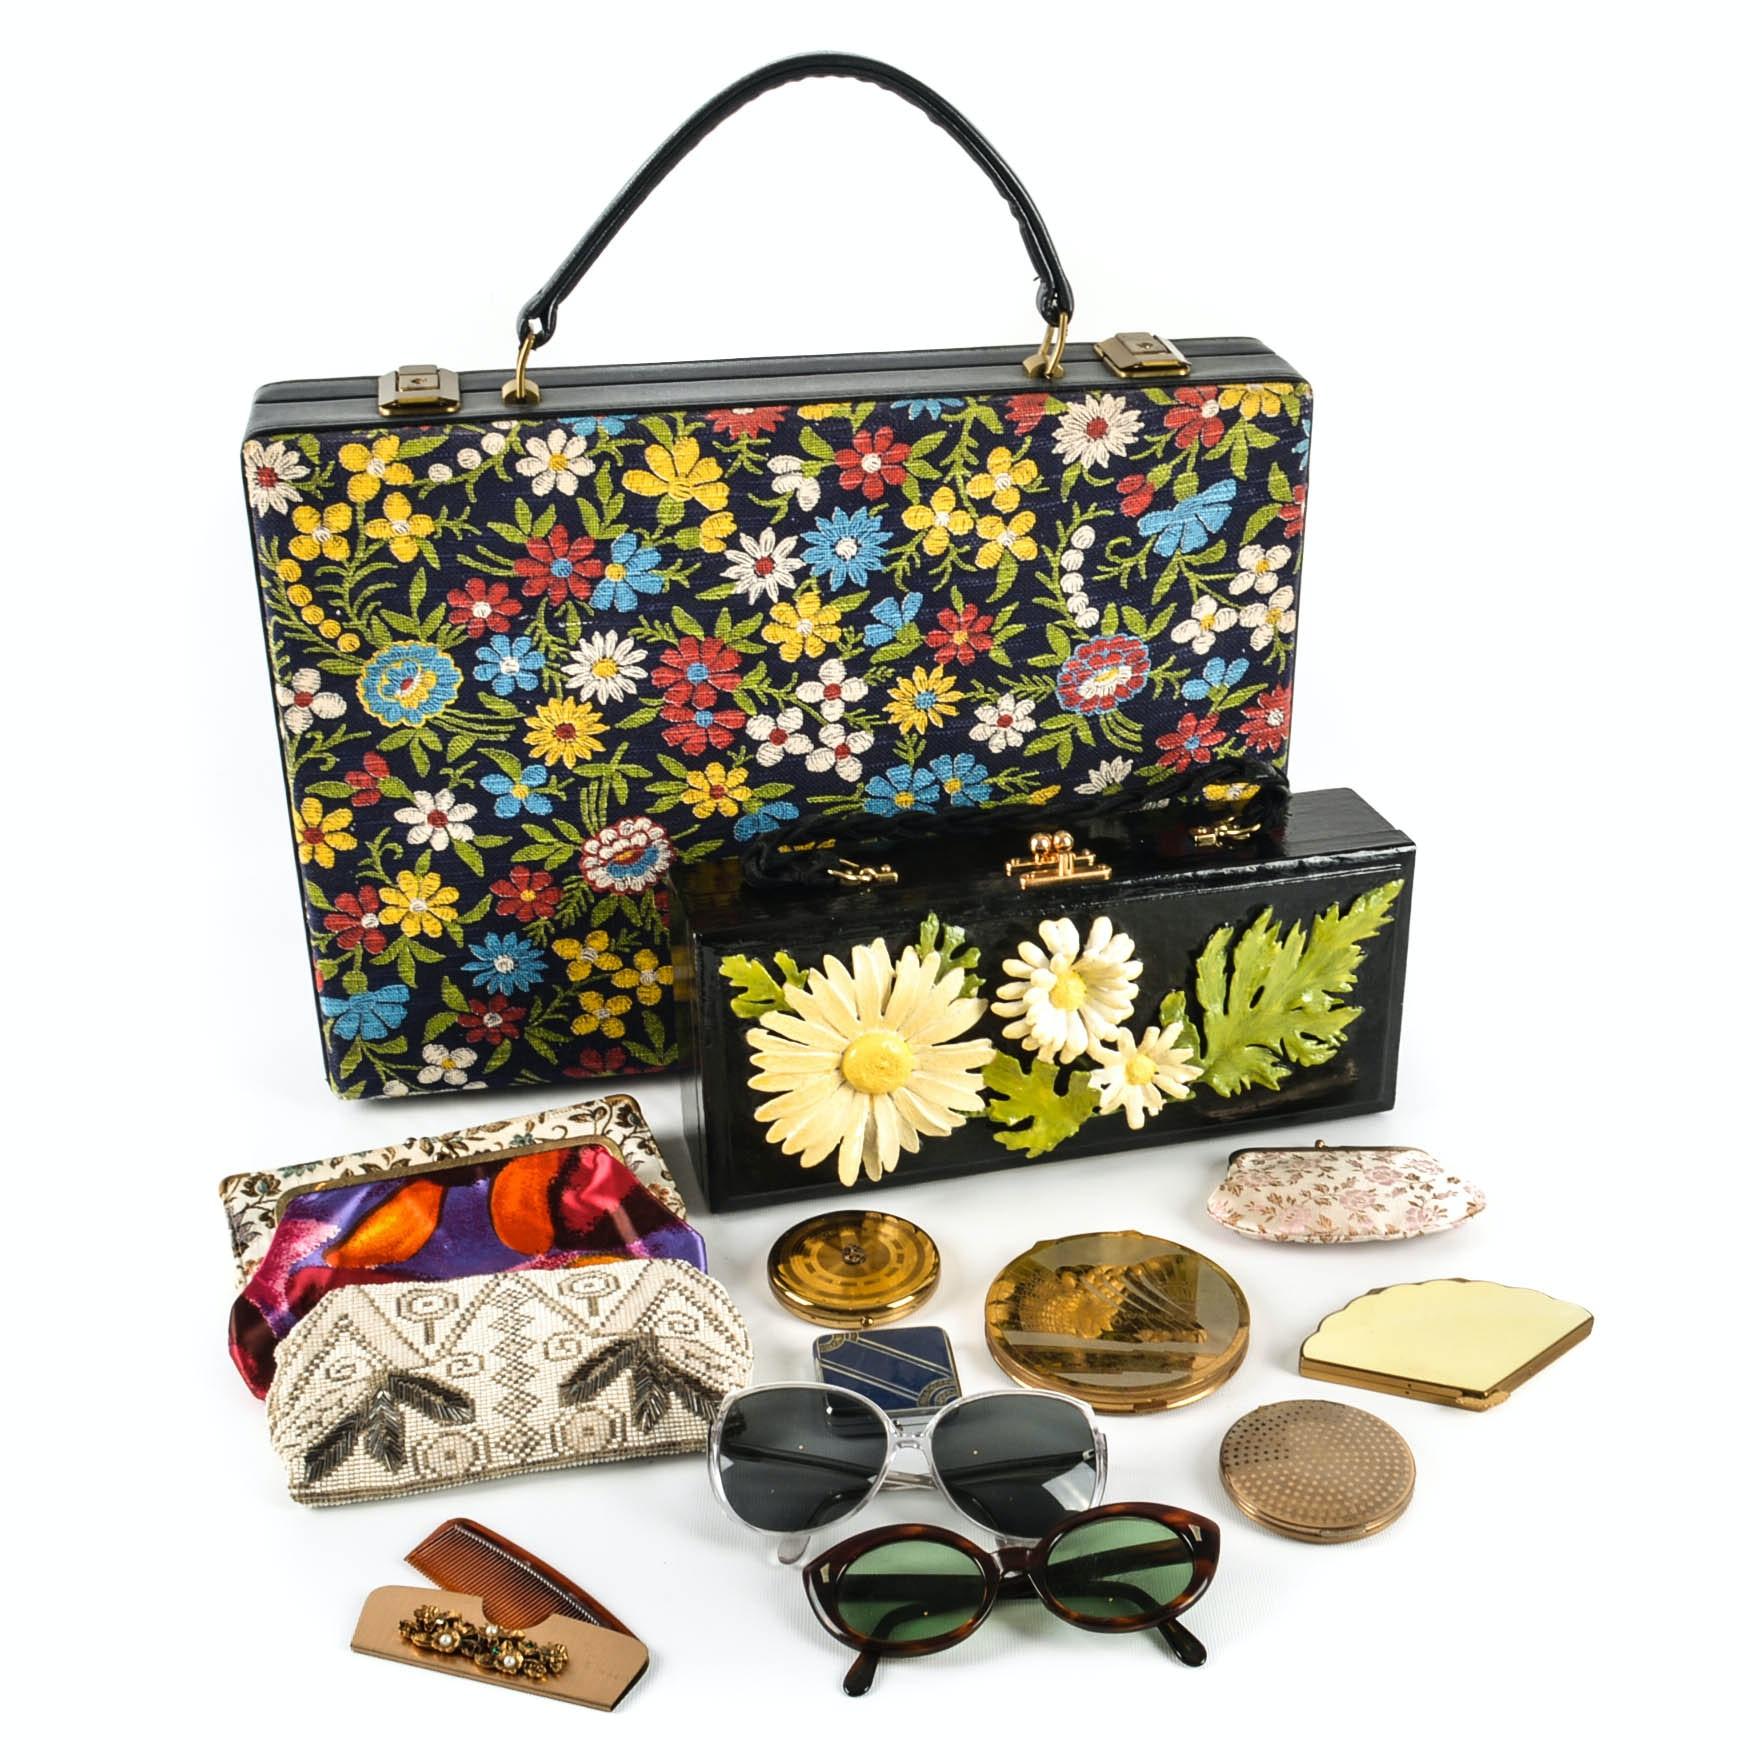 Vintage Attache Case, Box Purse, Powder Compacts, Change Purses and Sunglasses